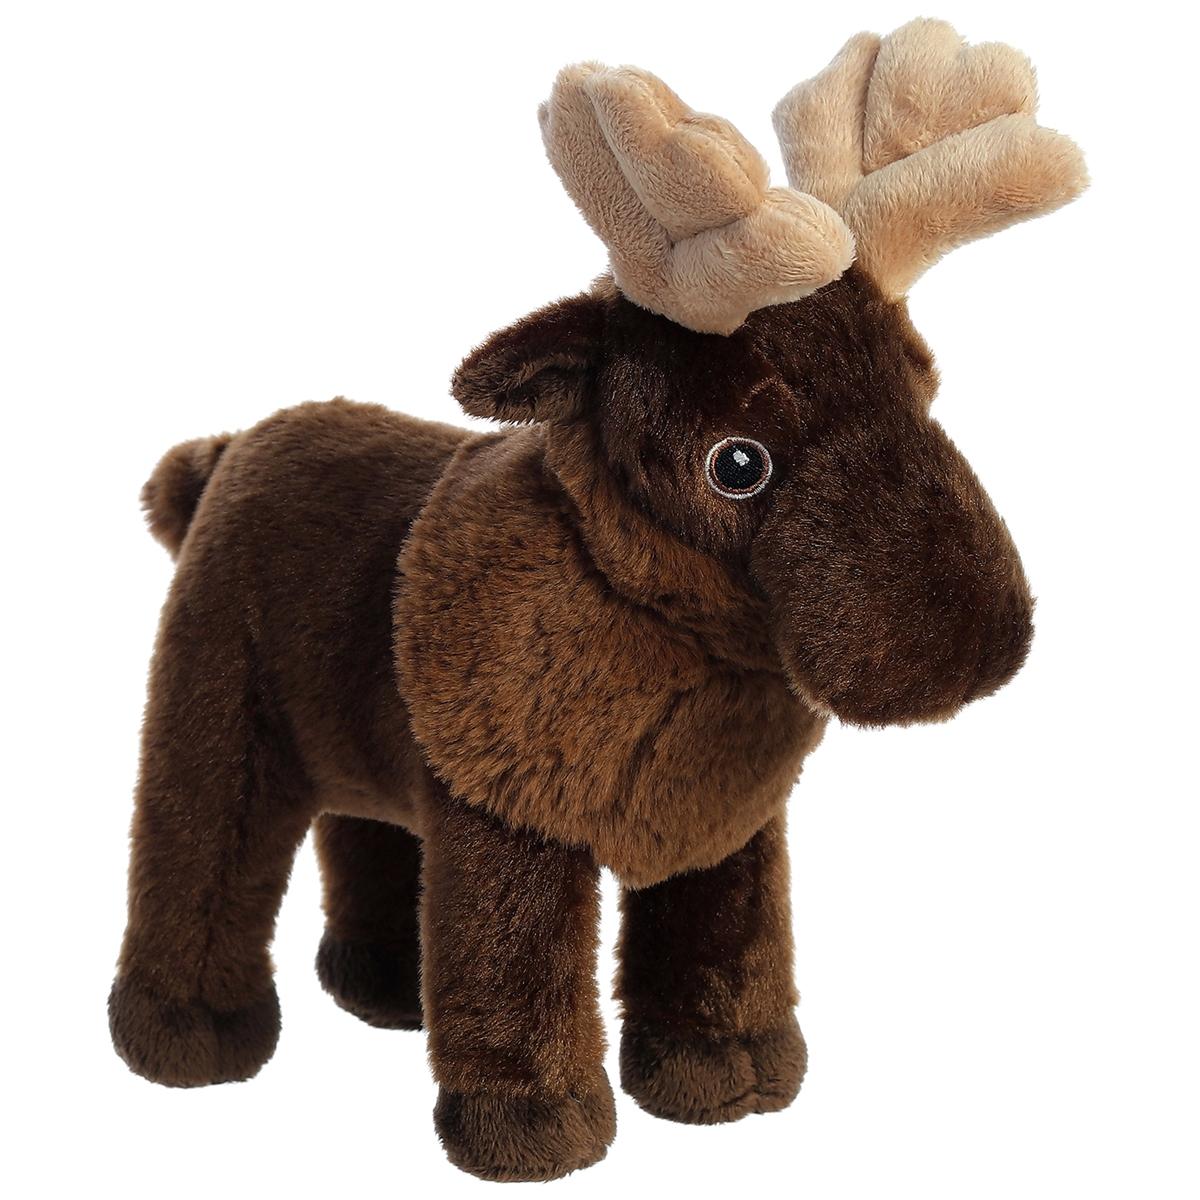 Moose Eco Plush